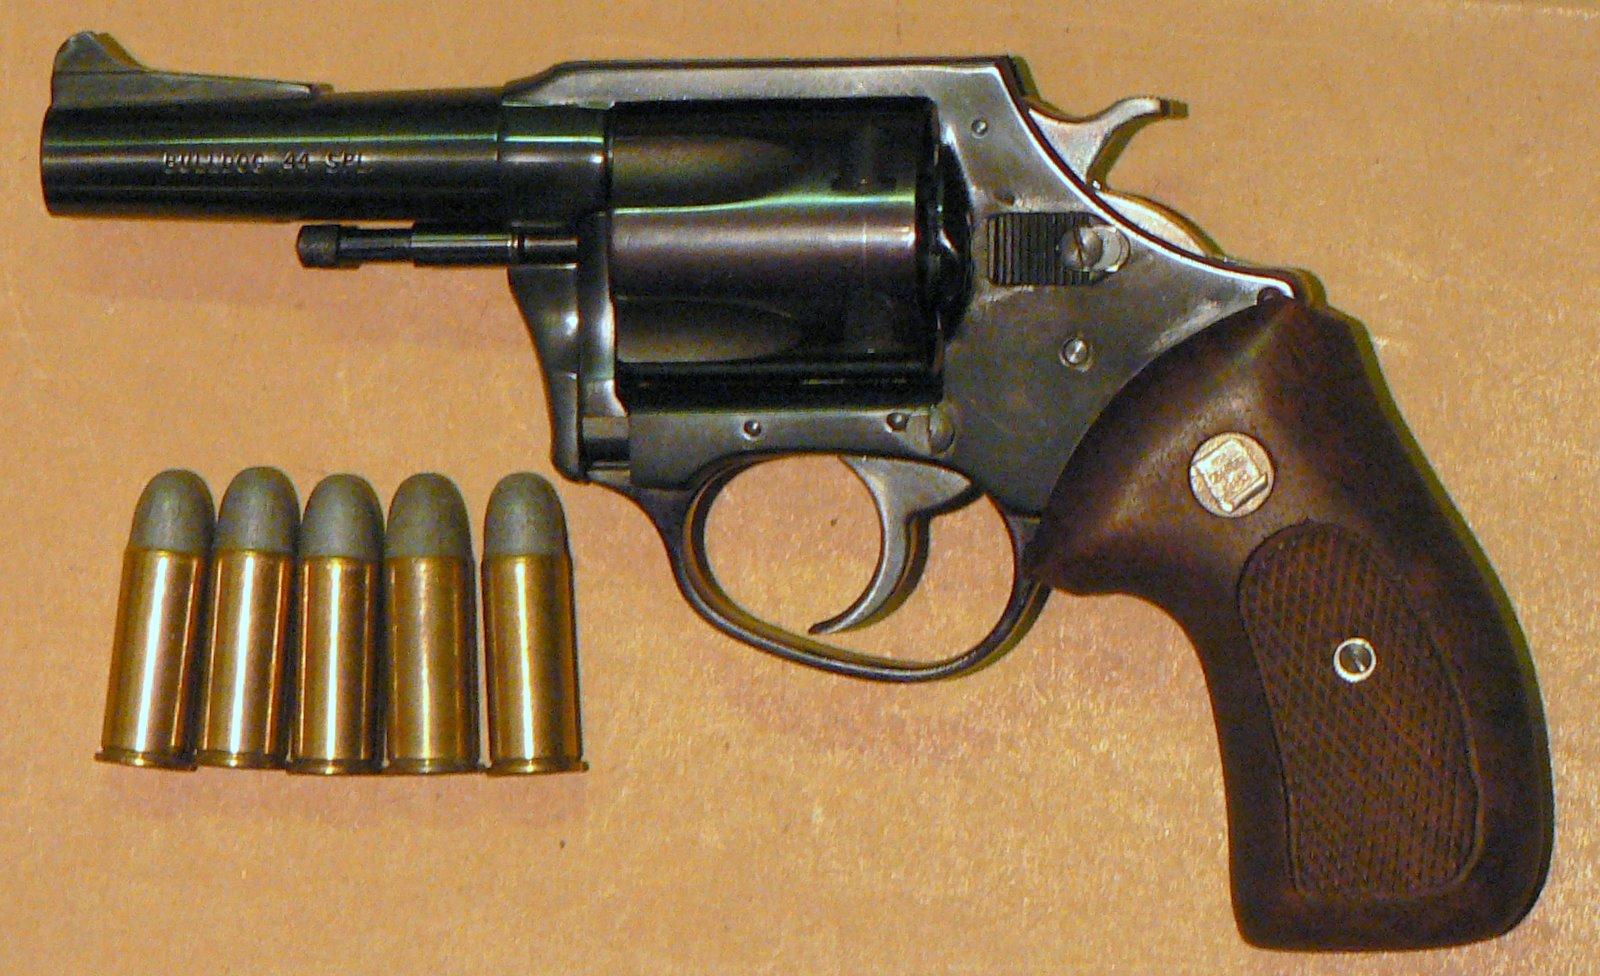 Charter Arms Bulldog - Wikipedia